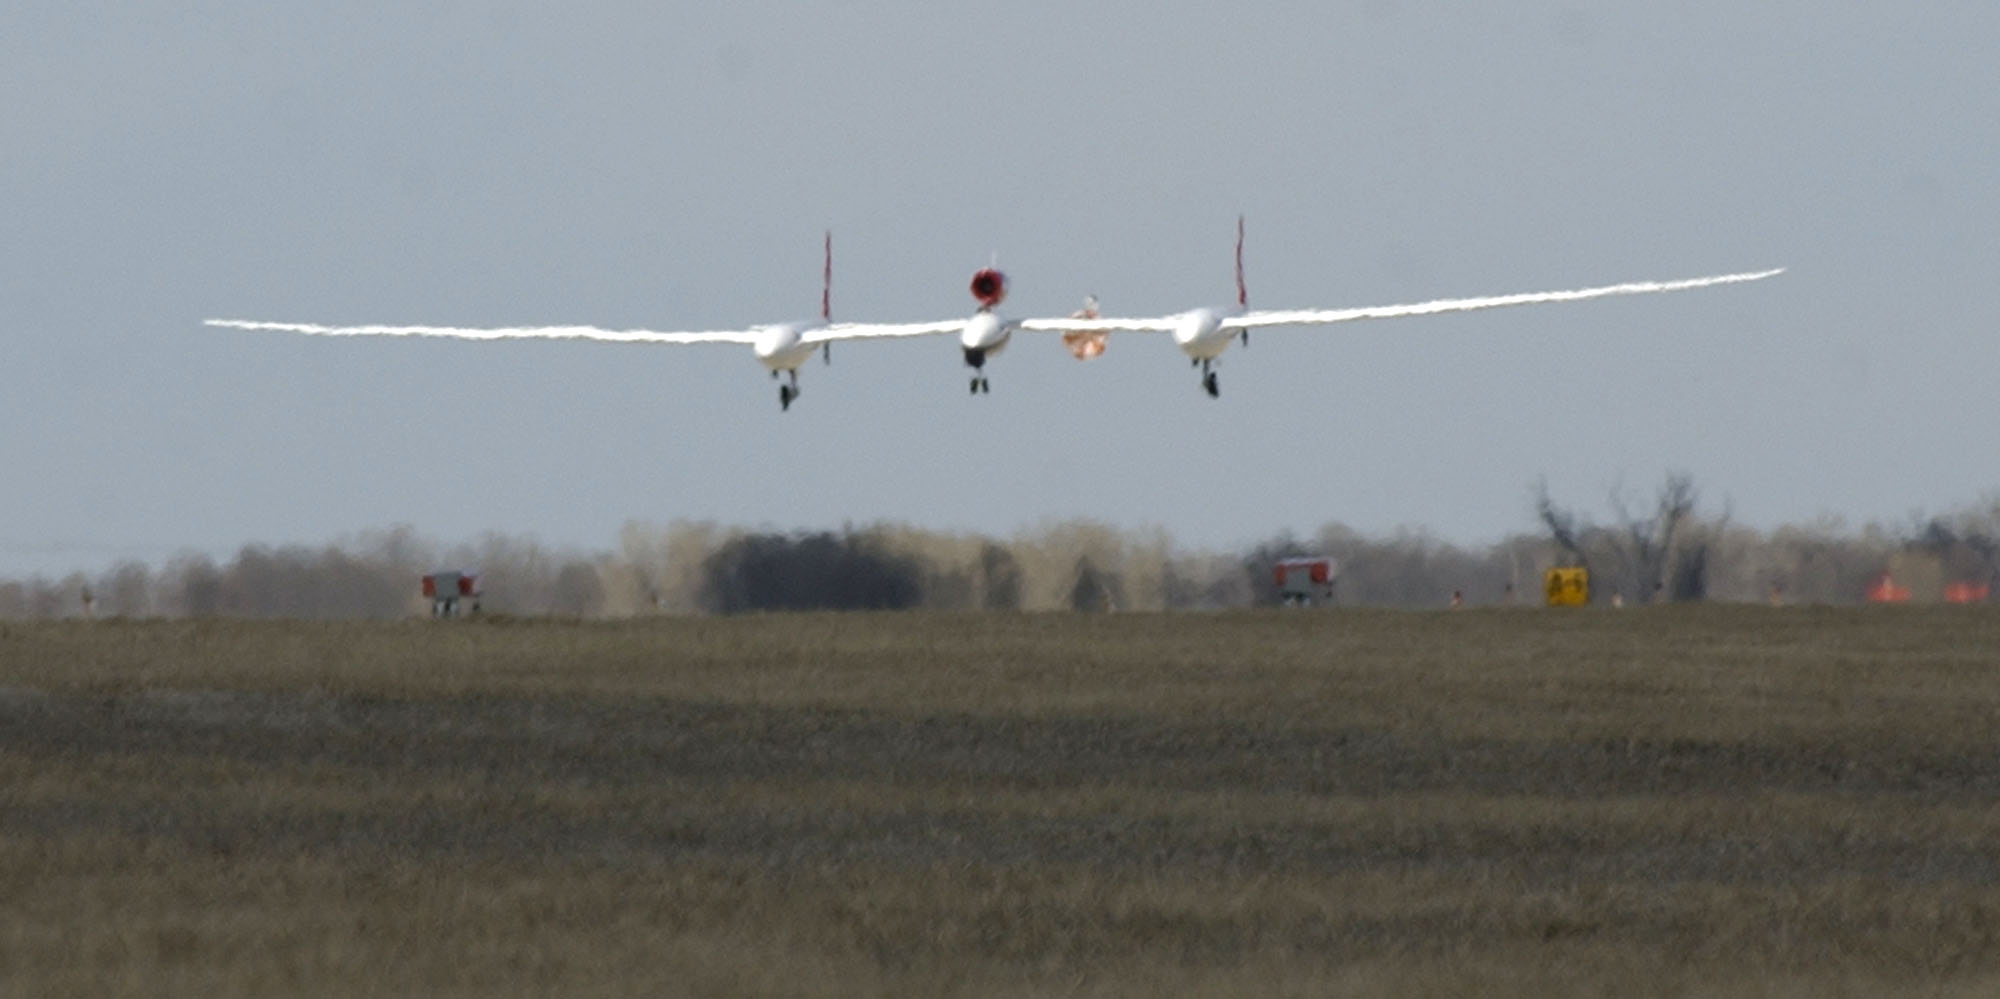 Fossett於2005年3月1日駕駛的「維珍航空環球飛行者」號返回起點Salina機場。文:許振輝/圖:美聯社